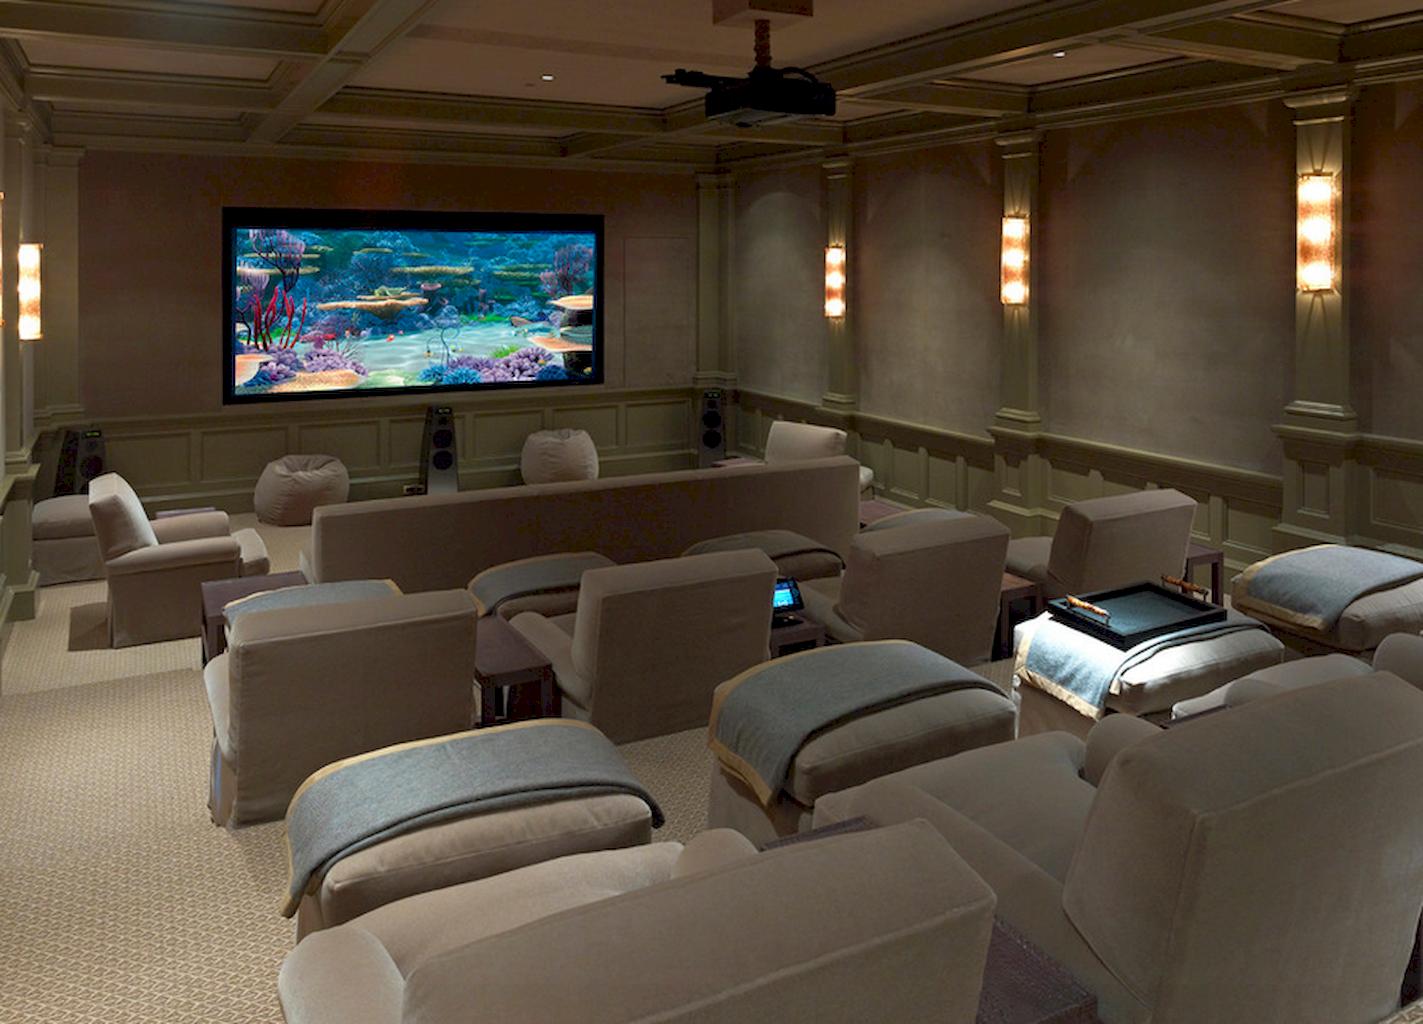 Sala de cine tipo teatro